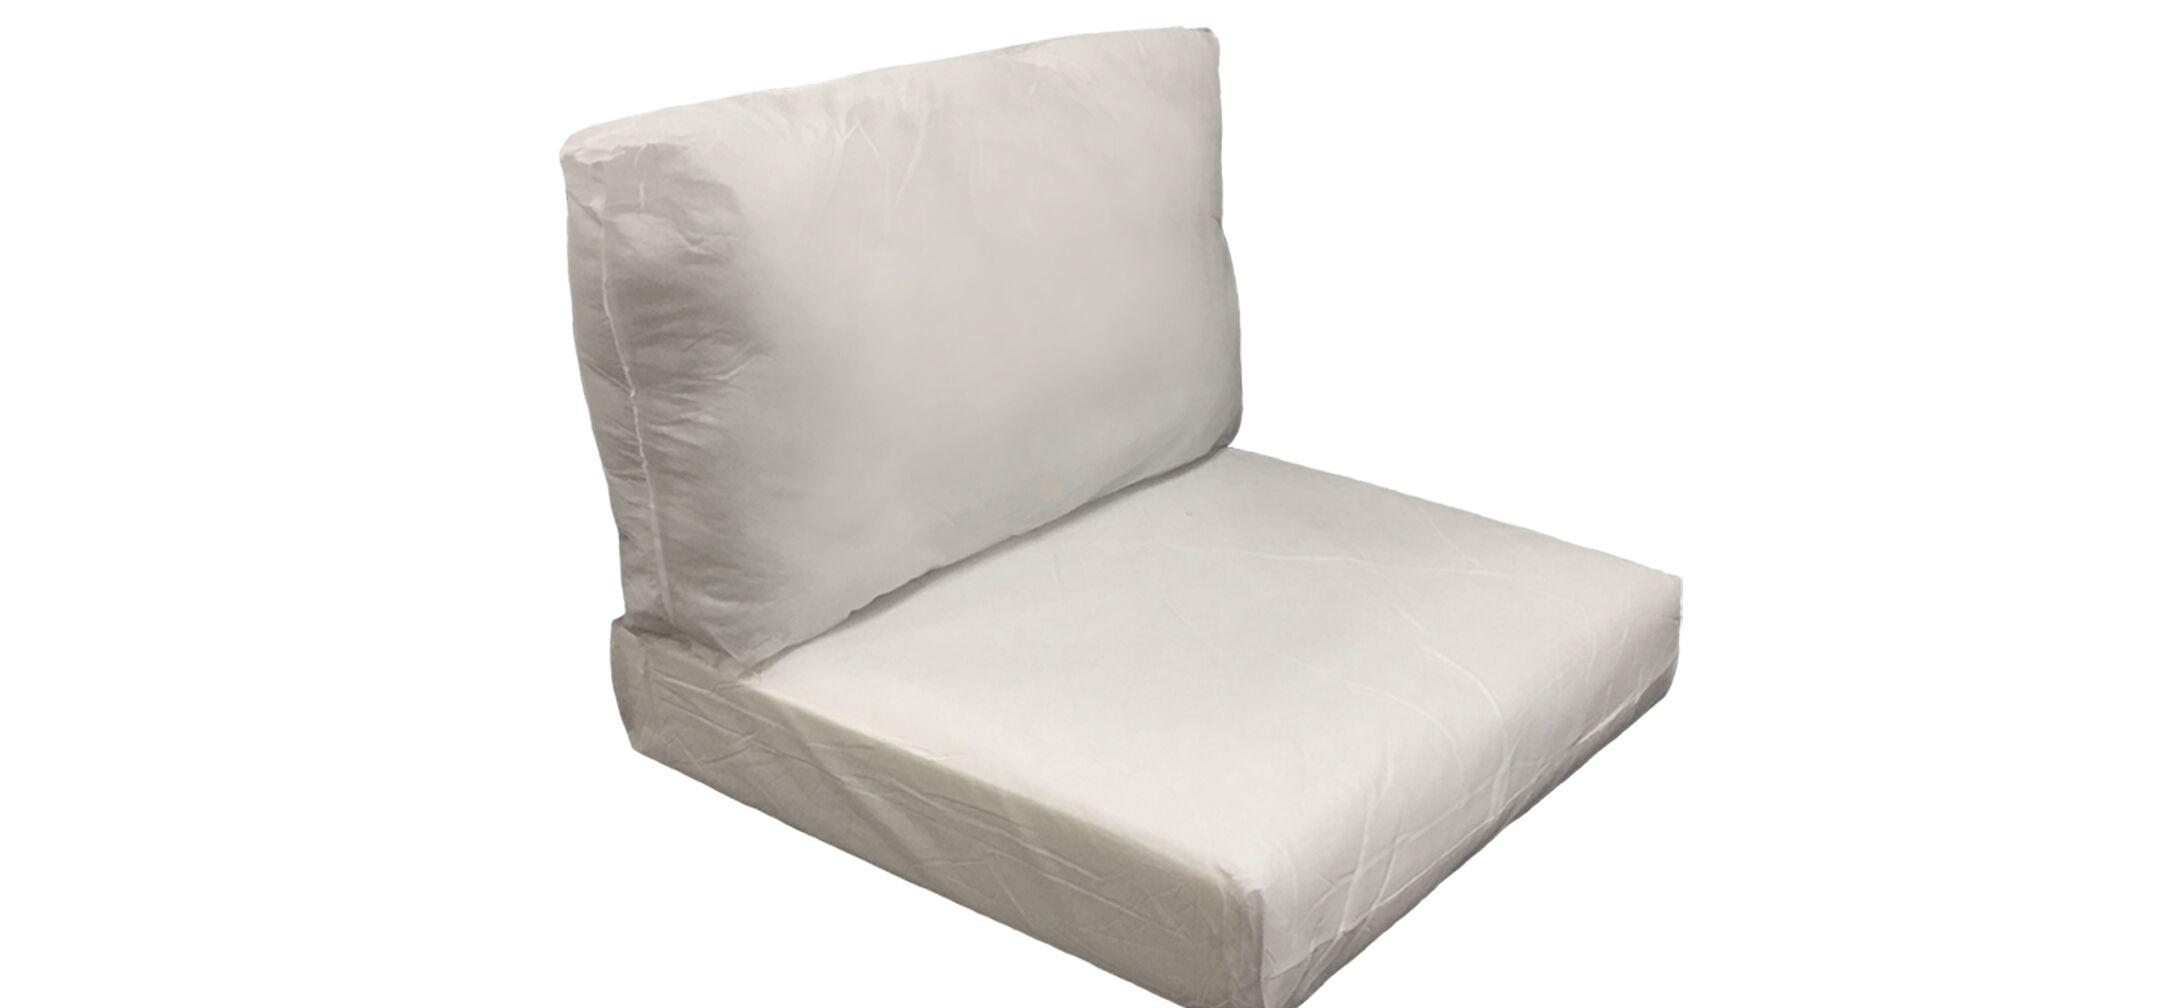 Fairmont 4 Piece Outdoor�Lounge Chair Cushion Set